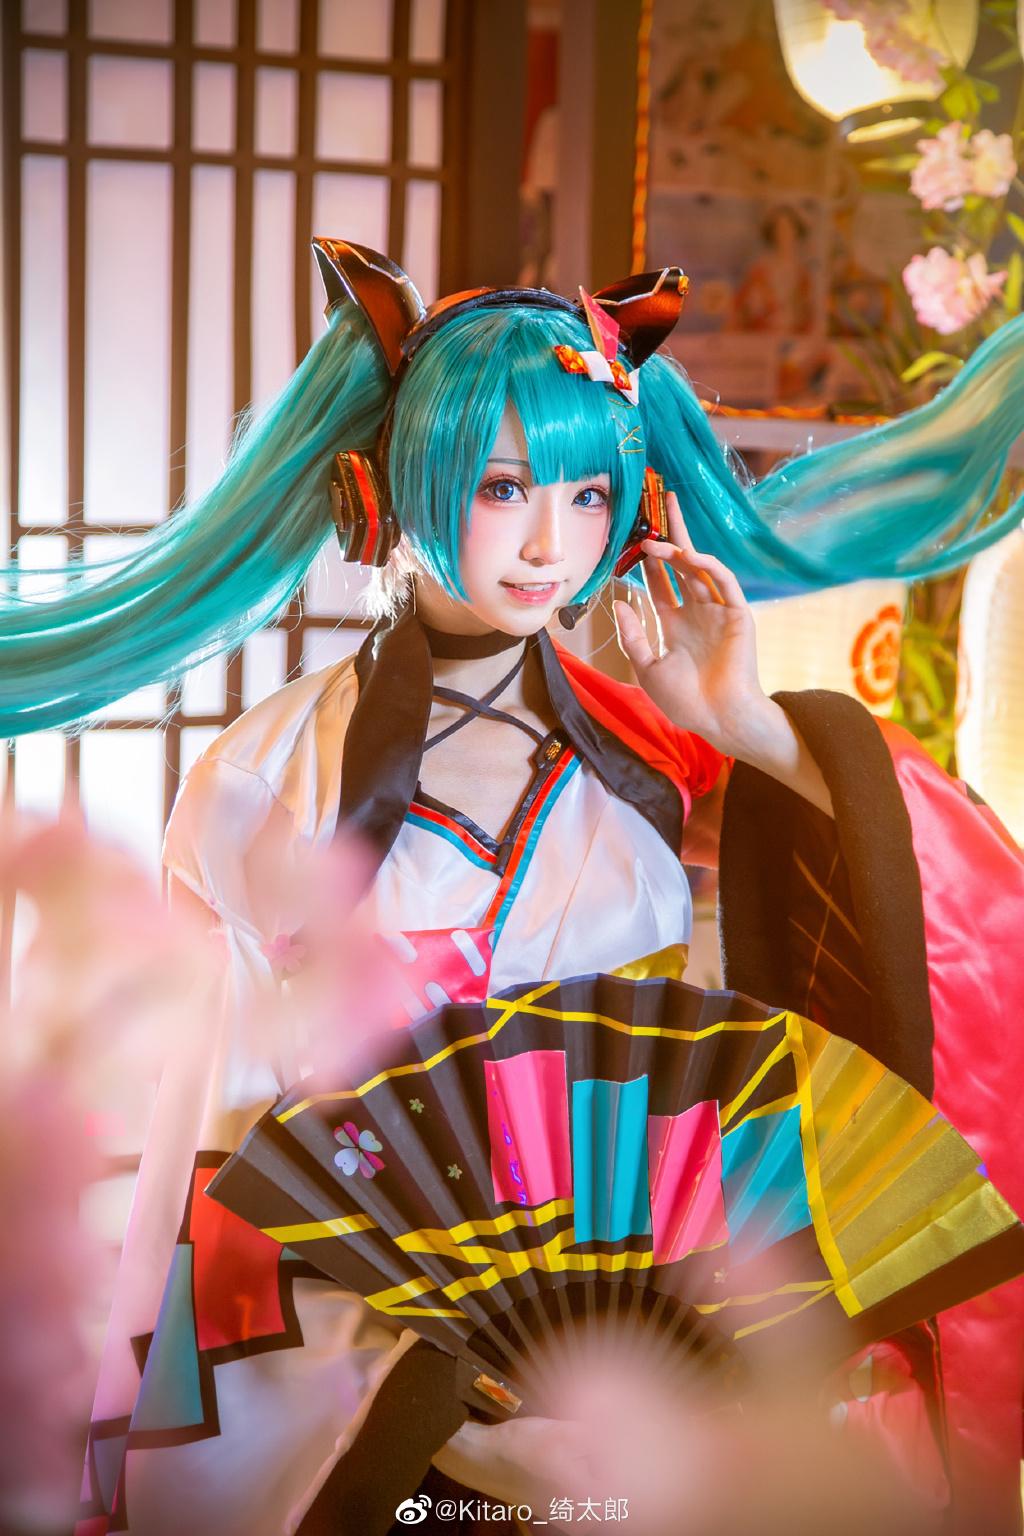 [COS]cosplay 初音未来 miku cos正片 @Kitaro_绮太郎 COSPLAY-第10张